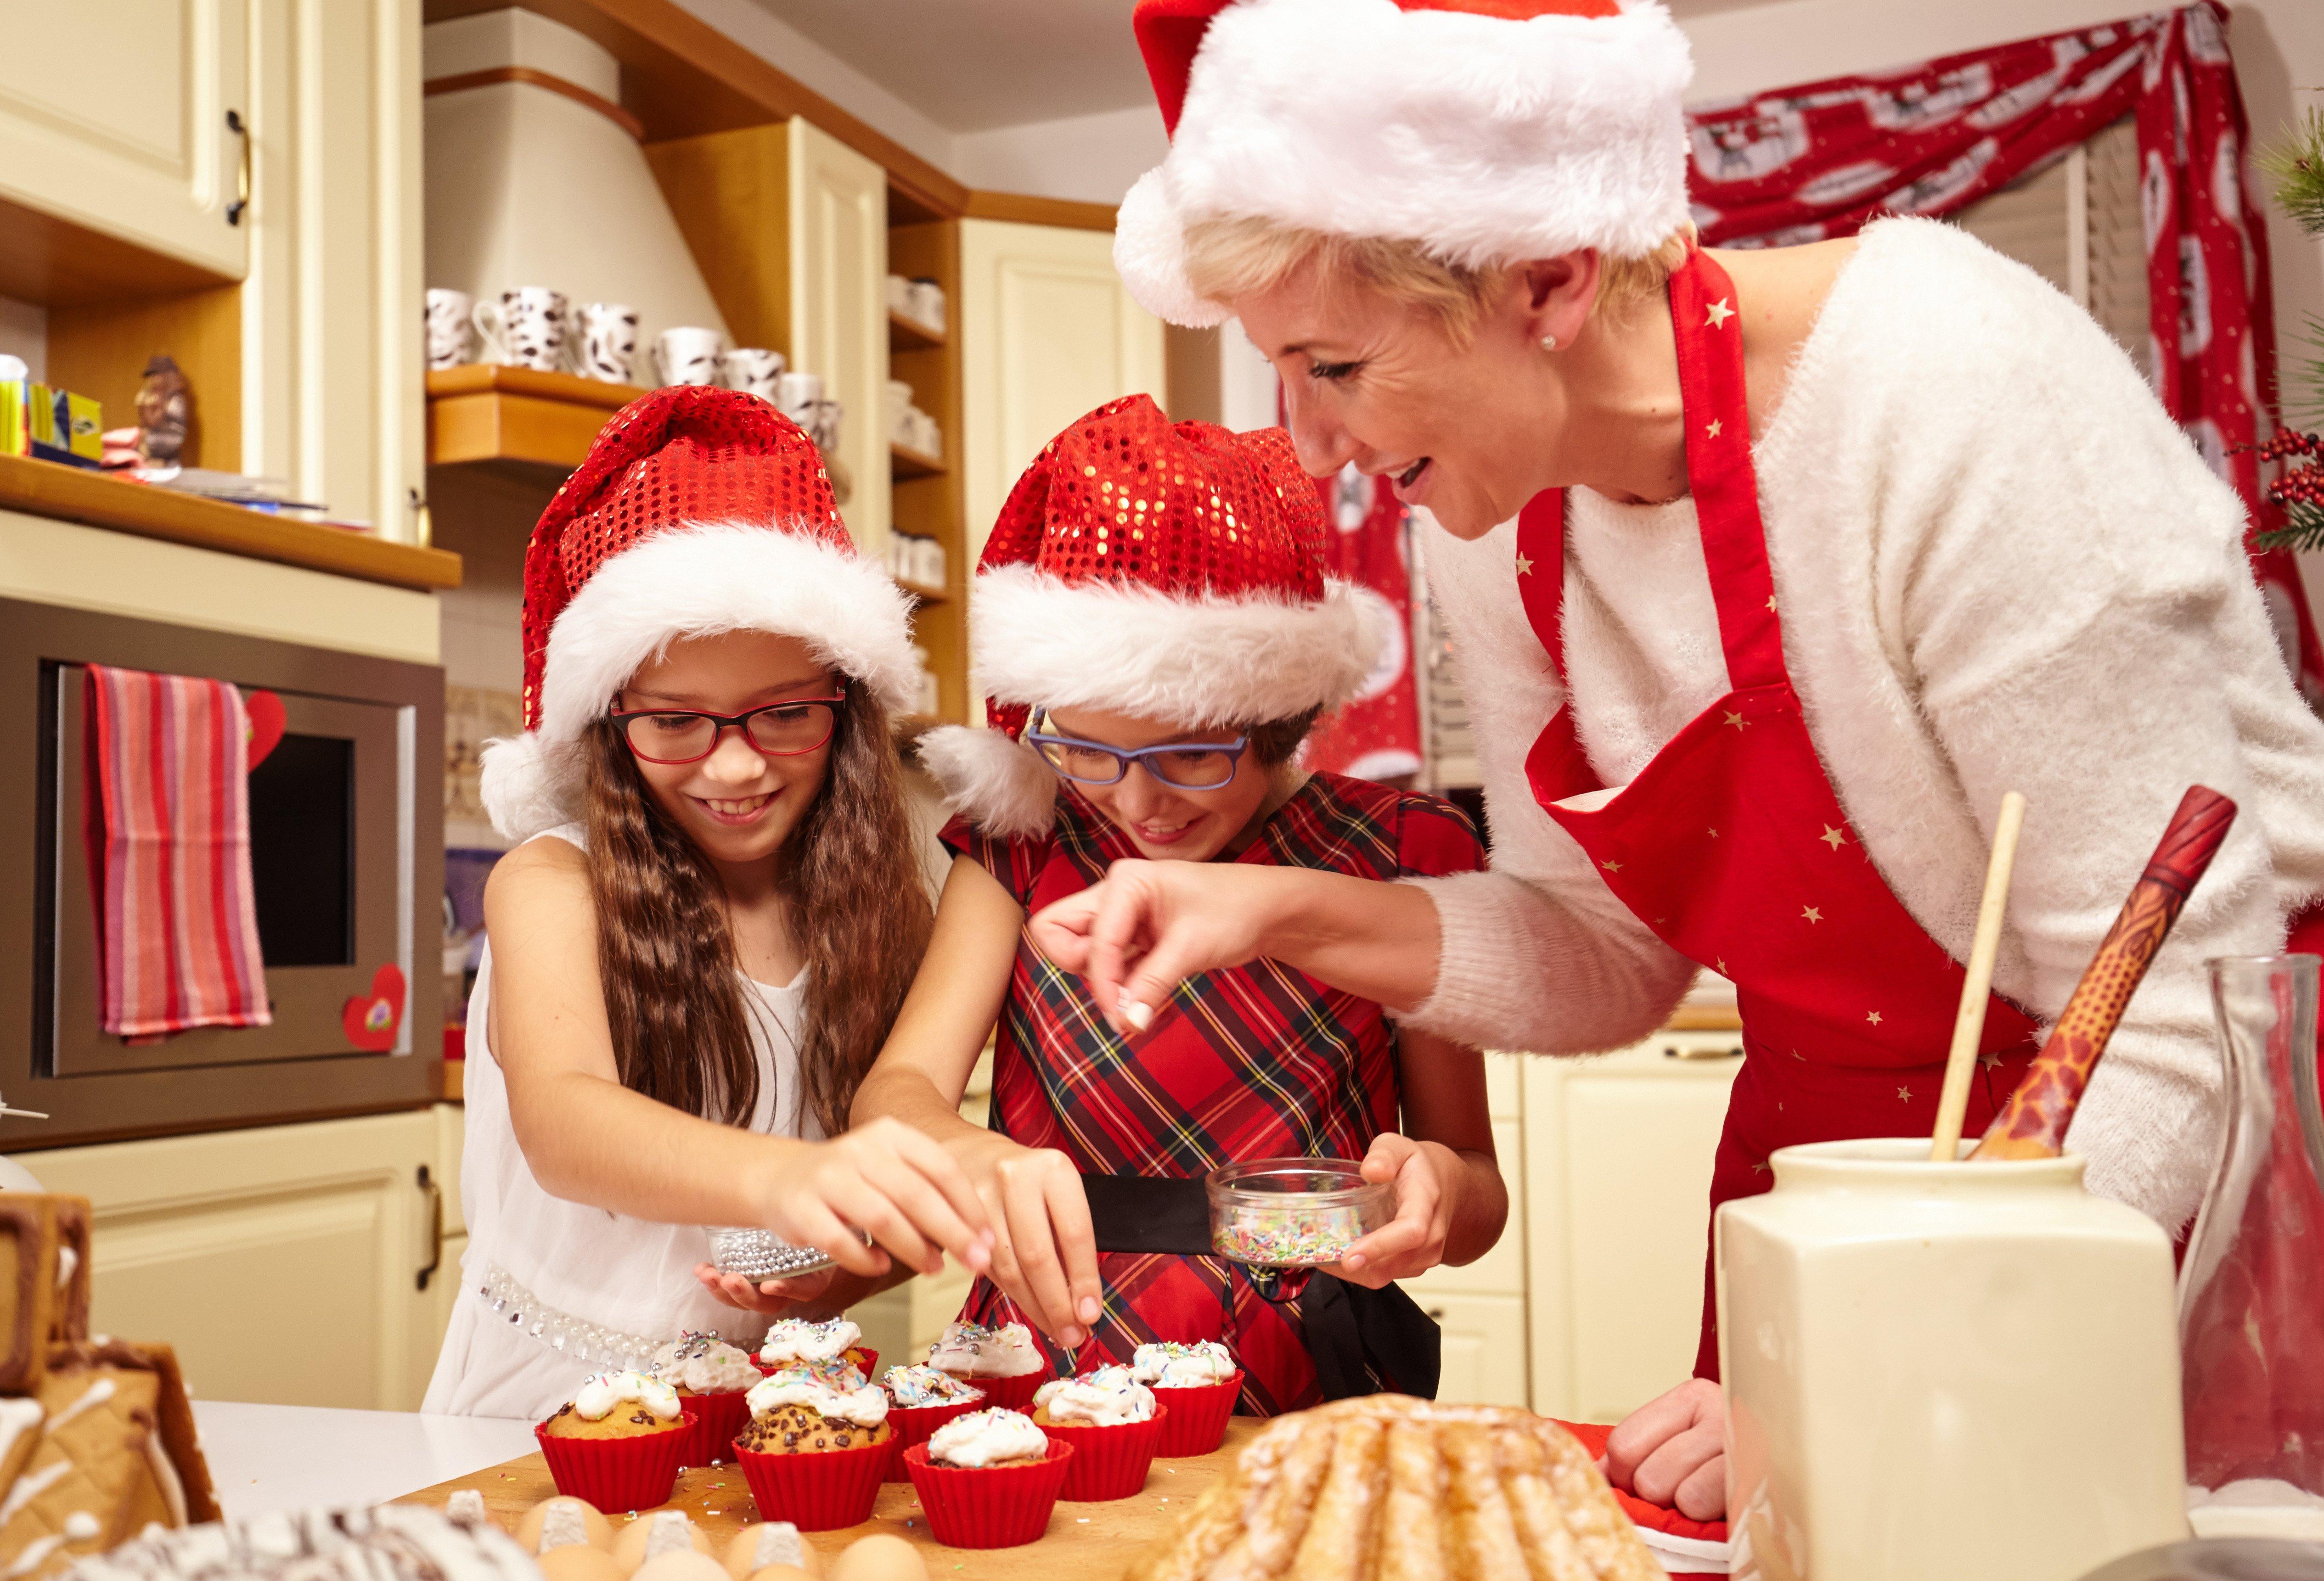 traditions- grandma and grandkids baking_347864039.jpg